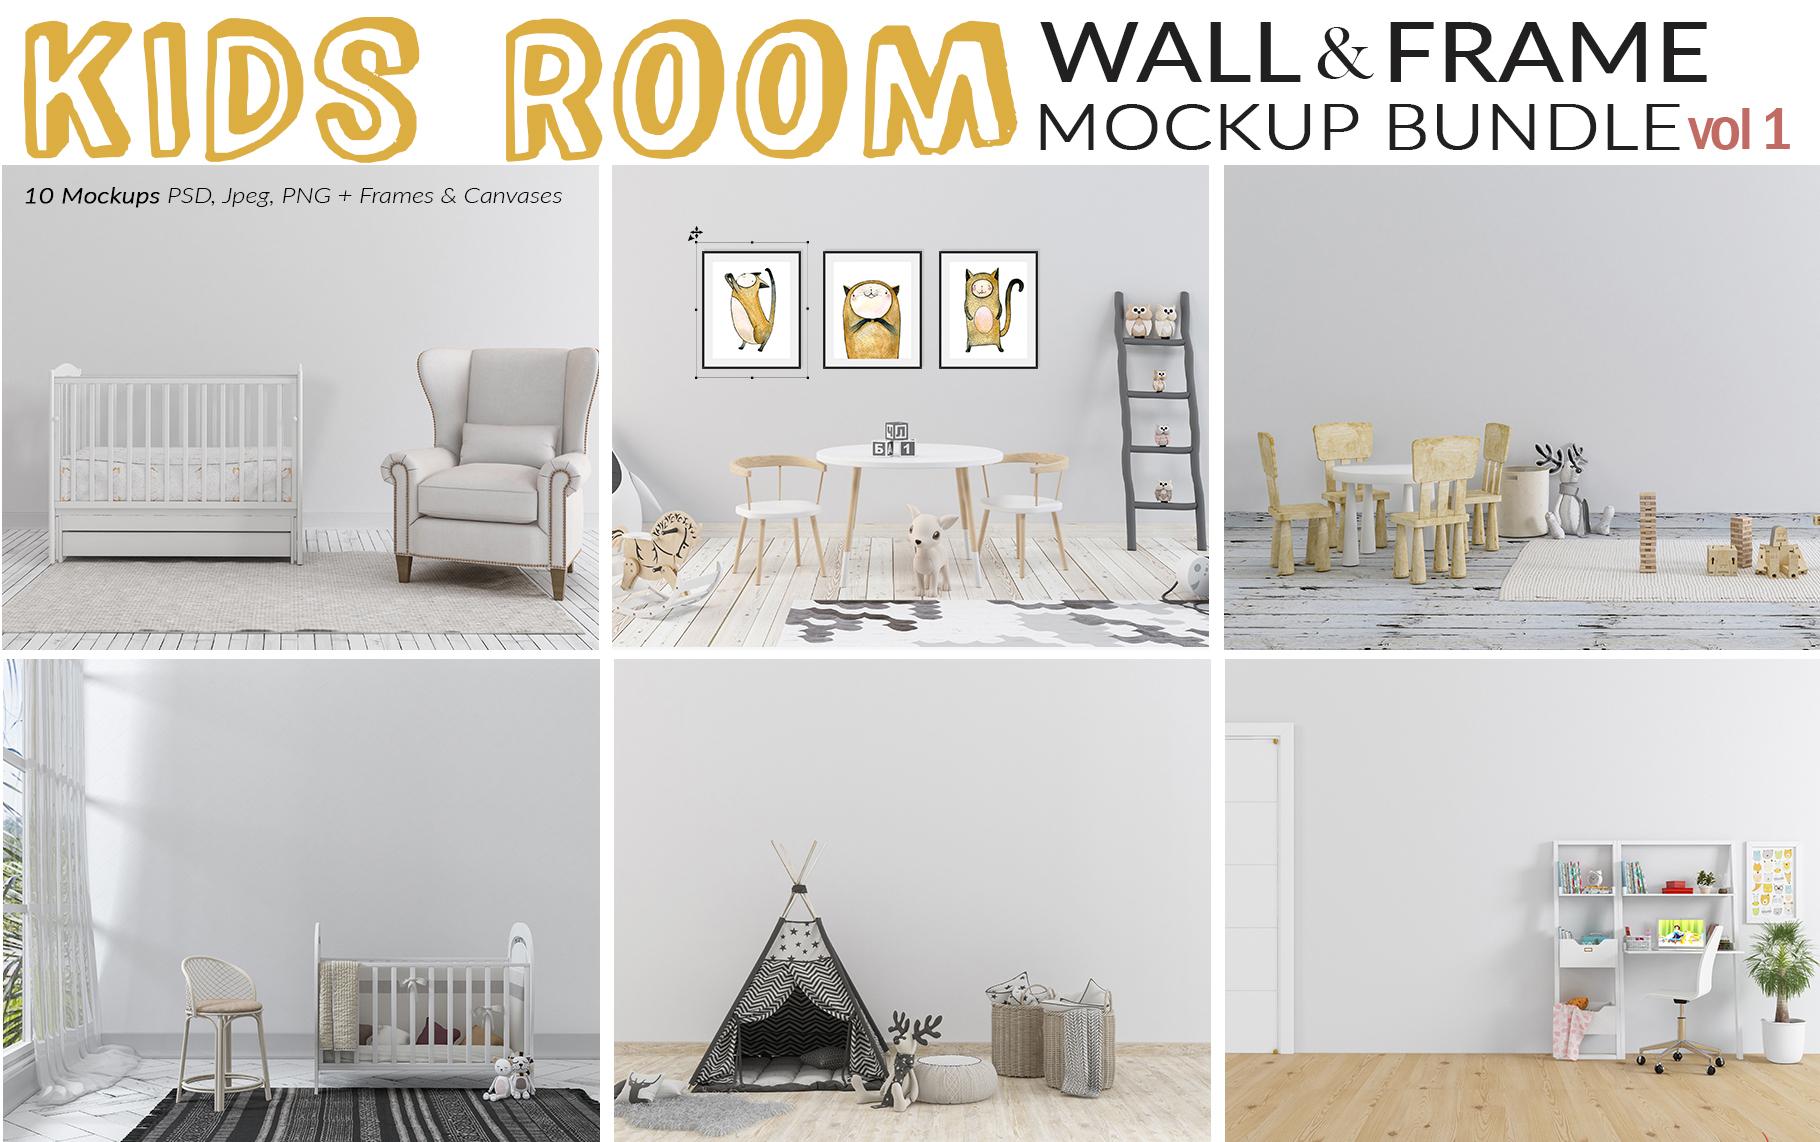 Massive Interior Wall Mockup, Frame Mockup Bundle FREE sampl example image 15